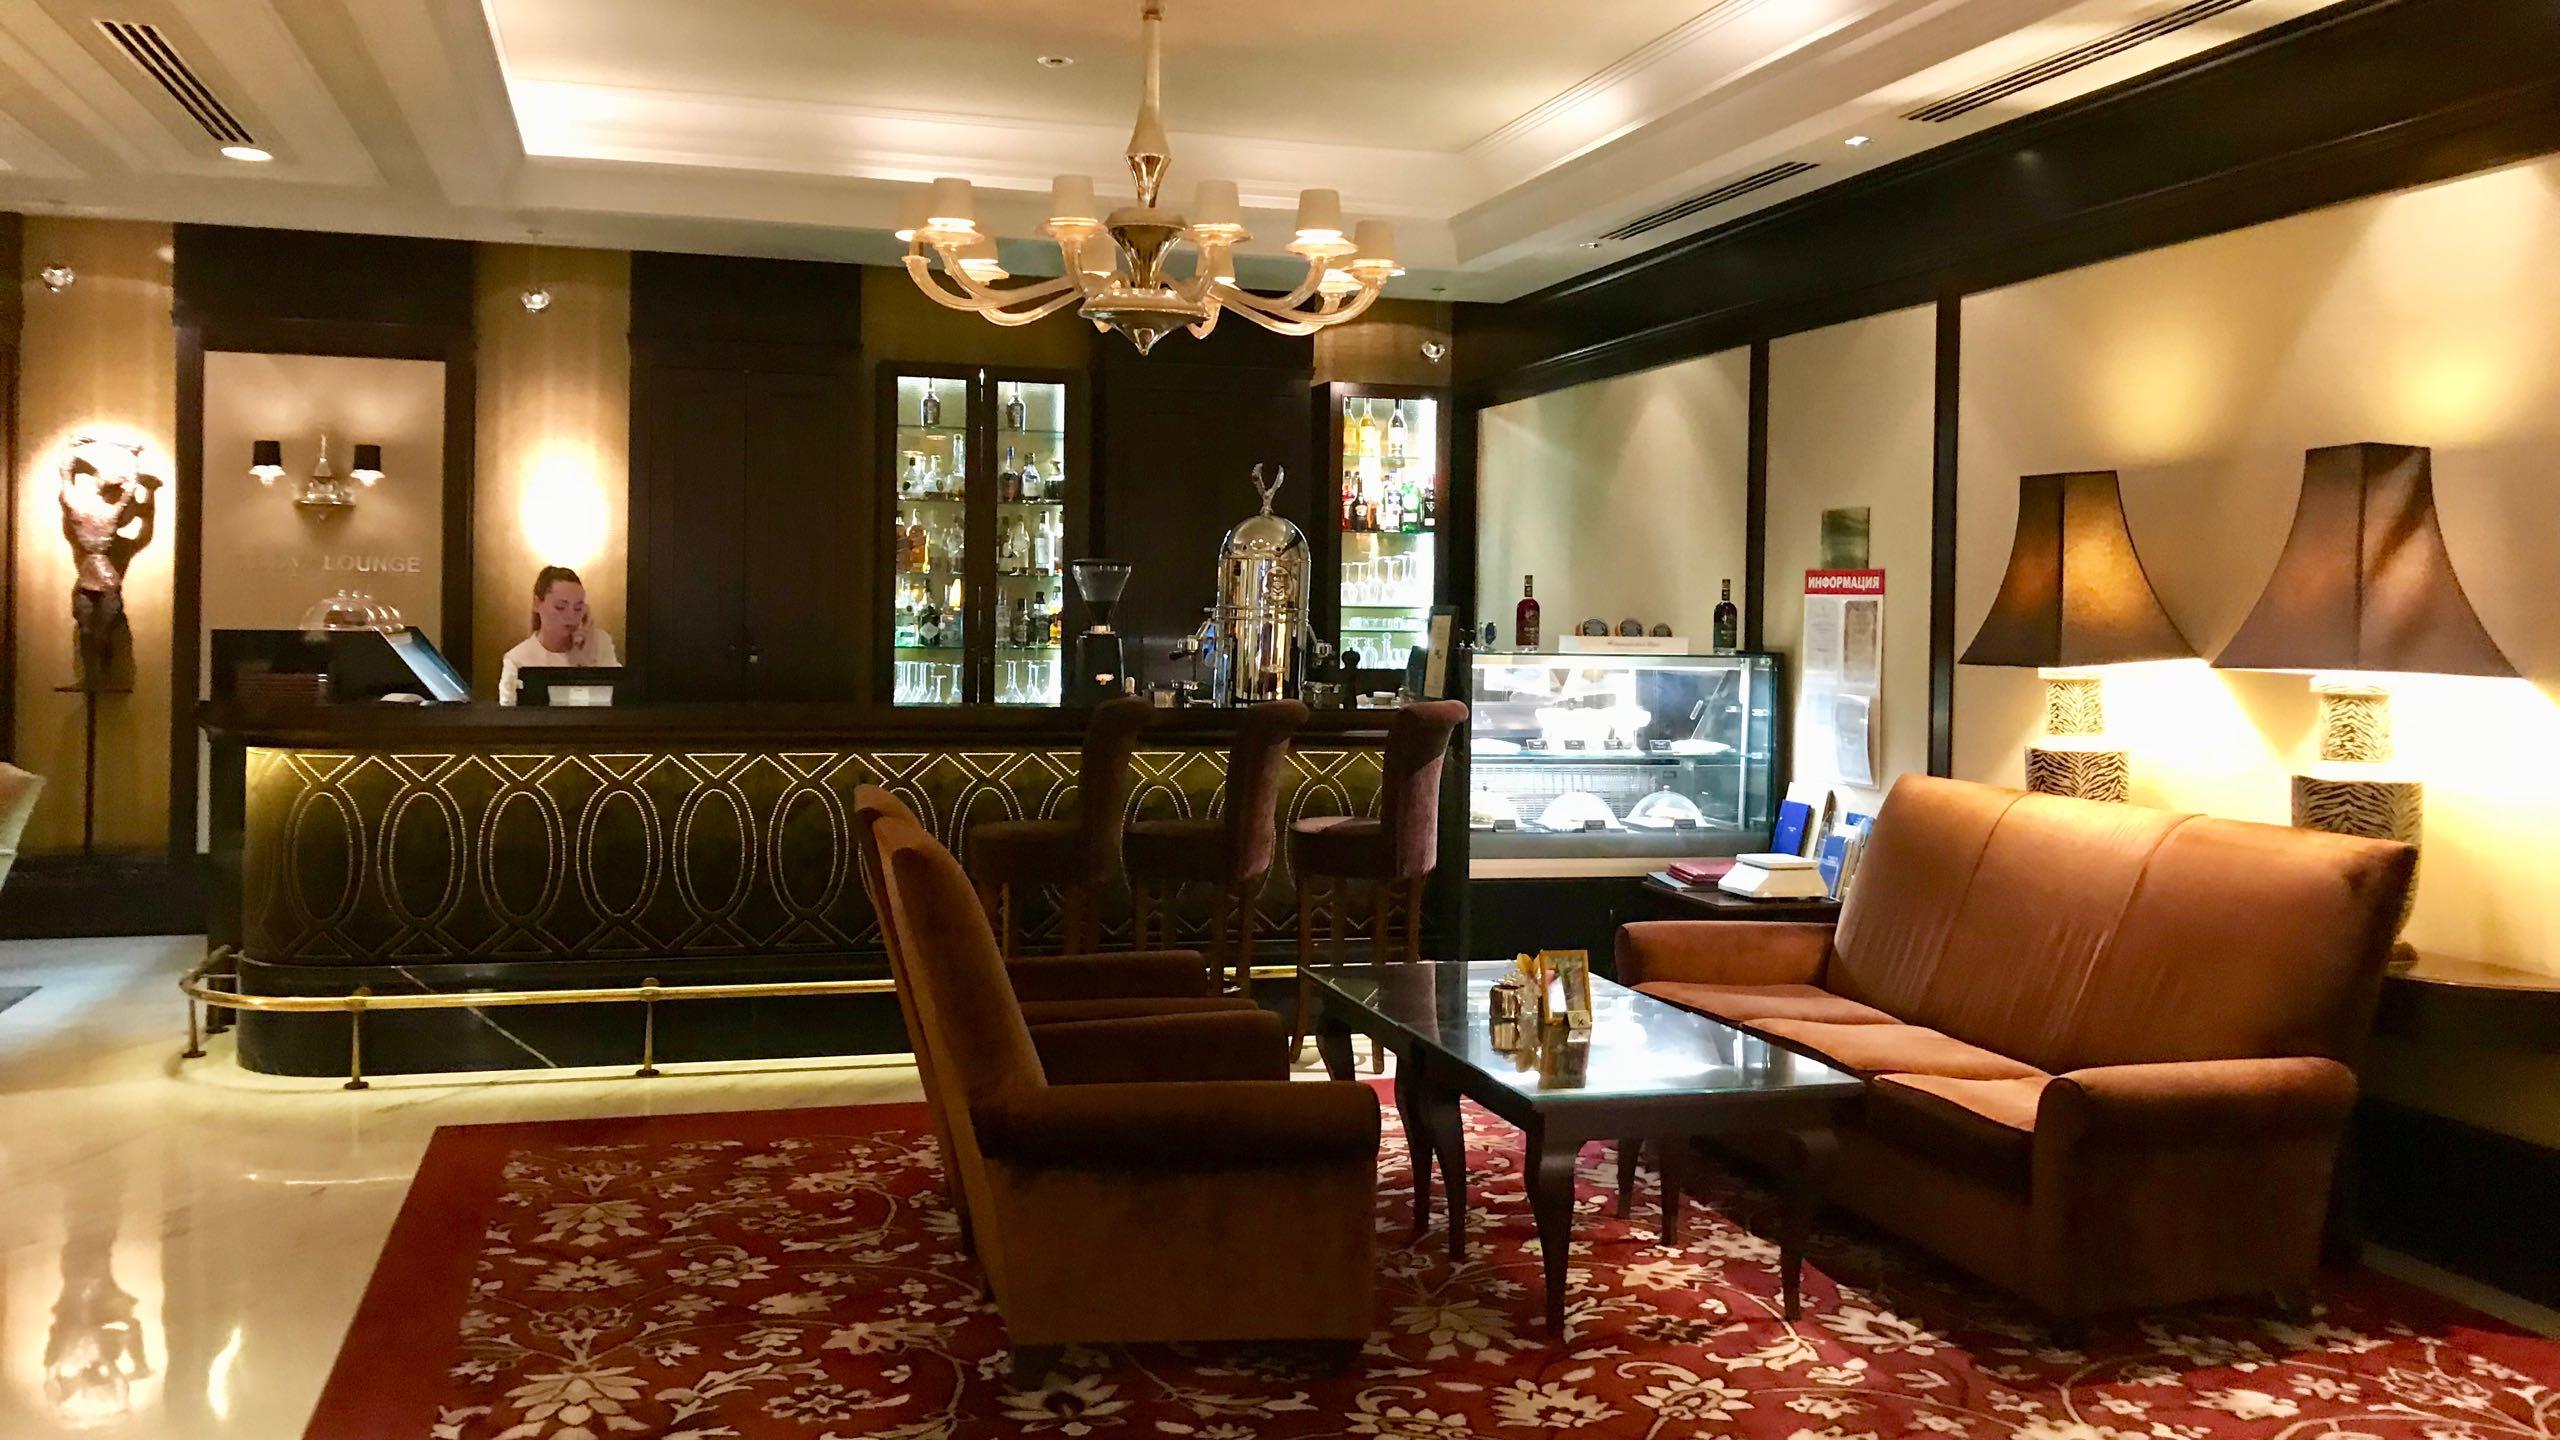 Luxushotel Baltschug Kempinski Moskau Bar und Lobby